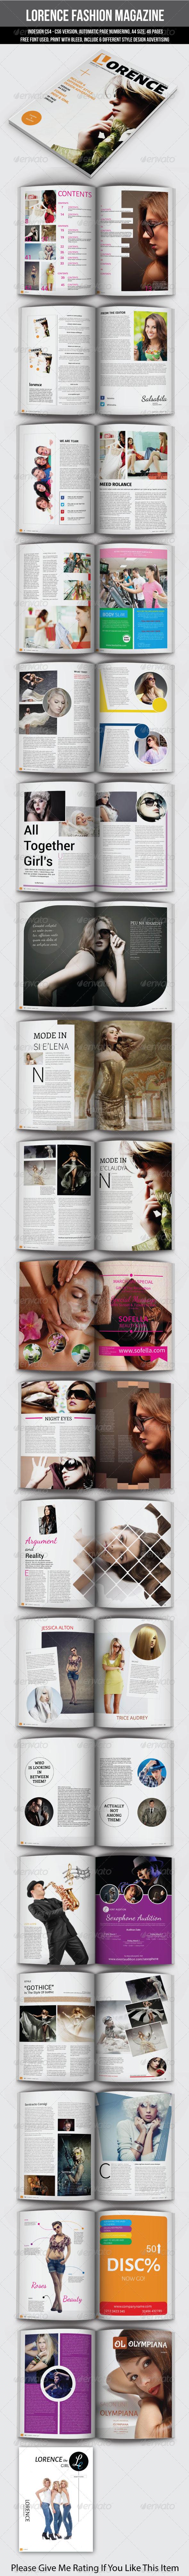 Lorence Fashion Magazine - Magazines Print Templates